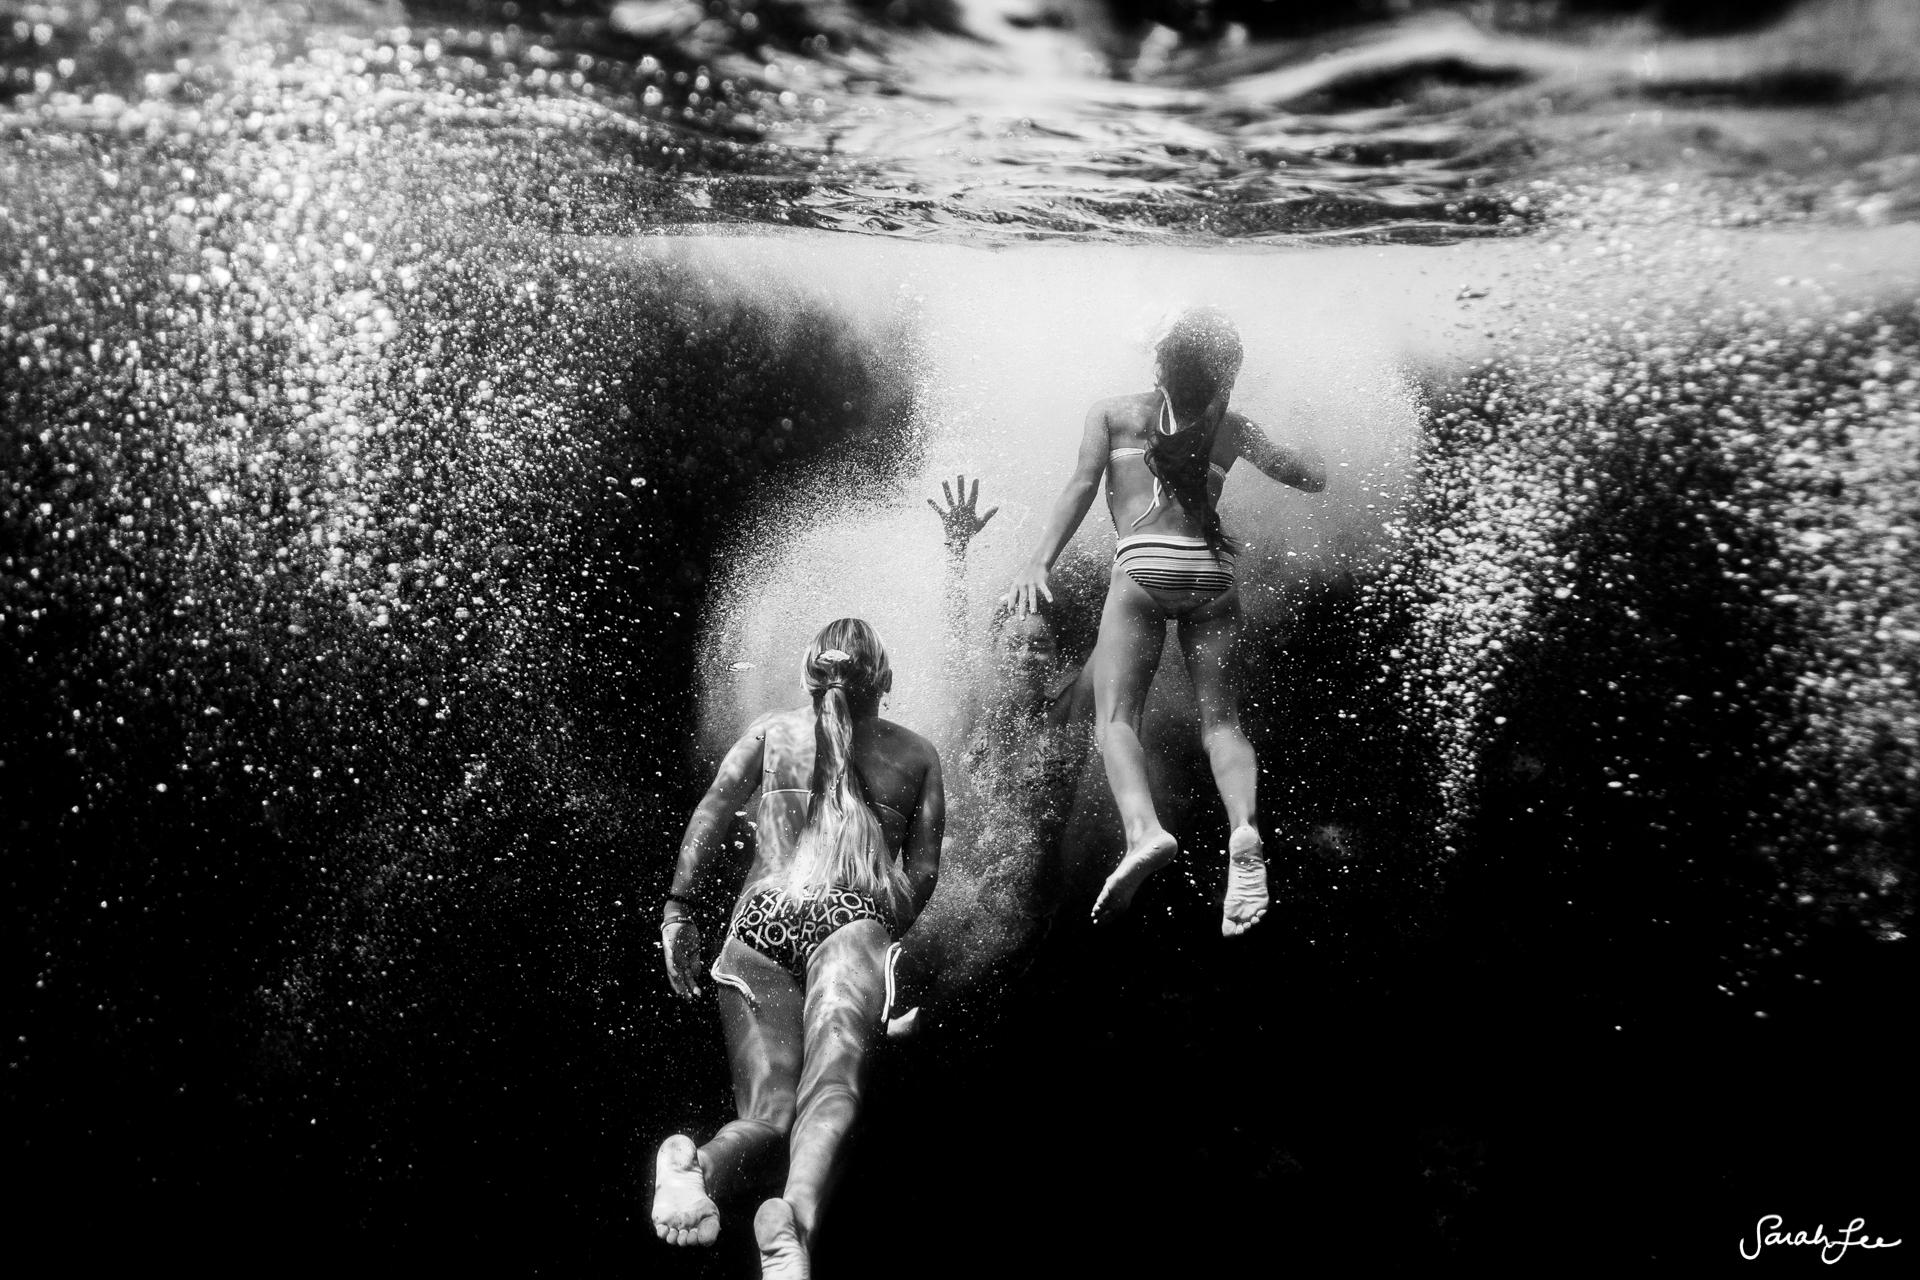 027_Sarah_Lee_Photography_Underwater_4984.jpg